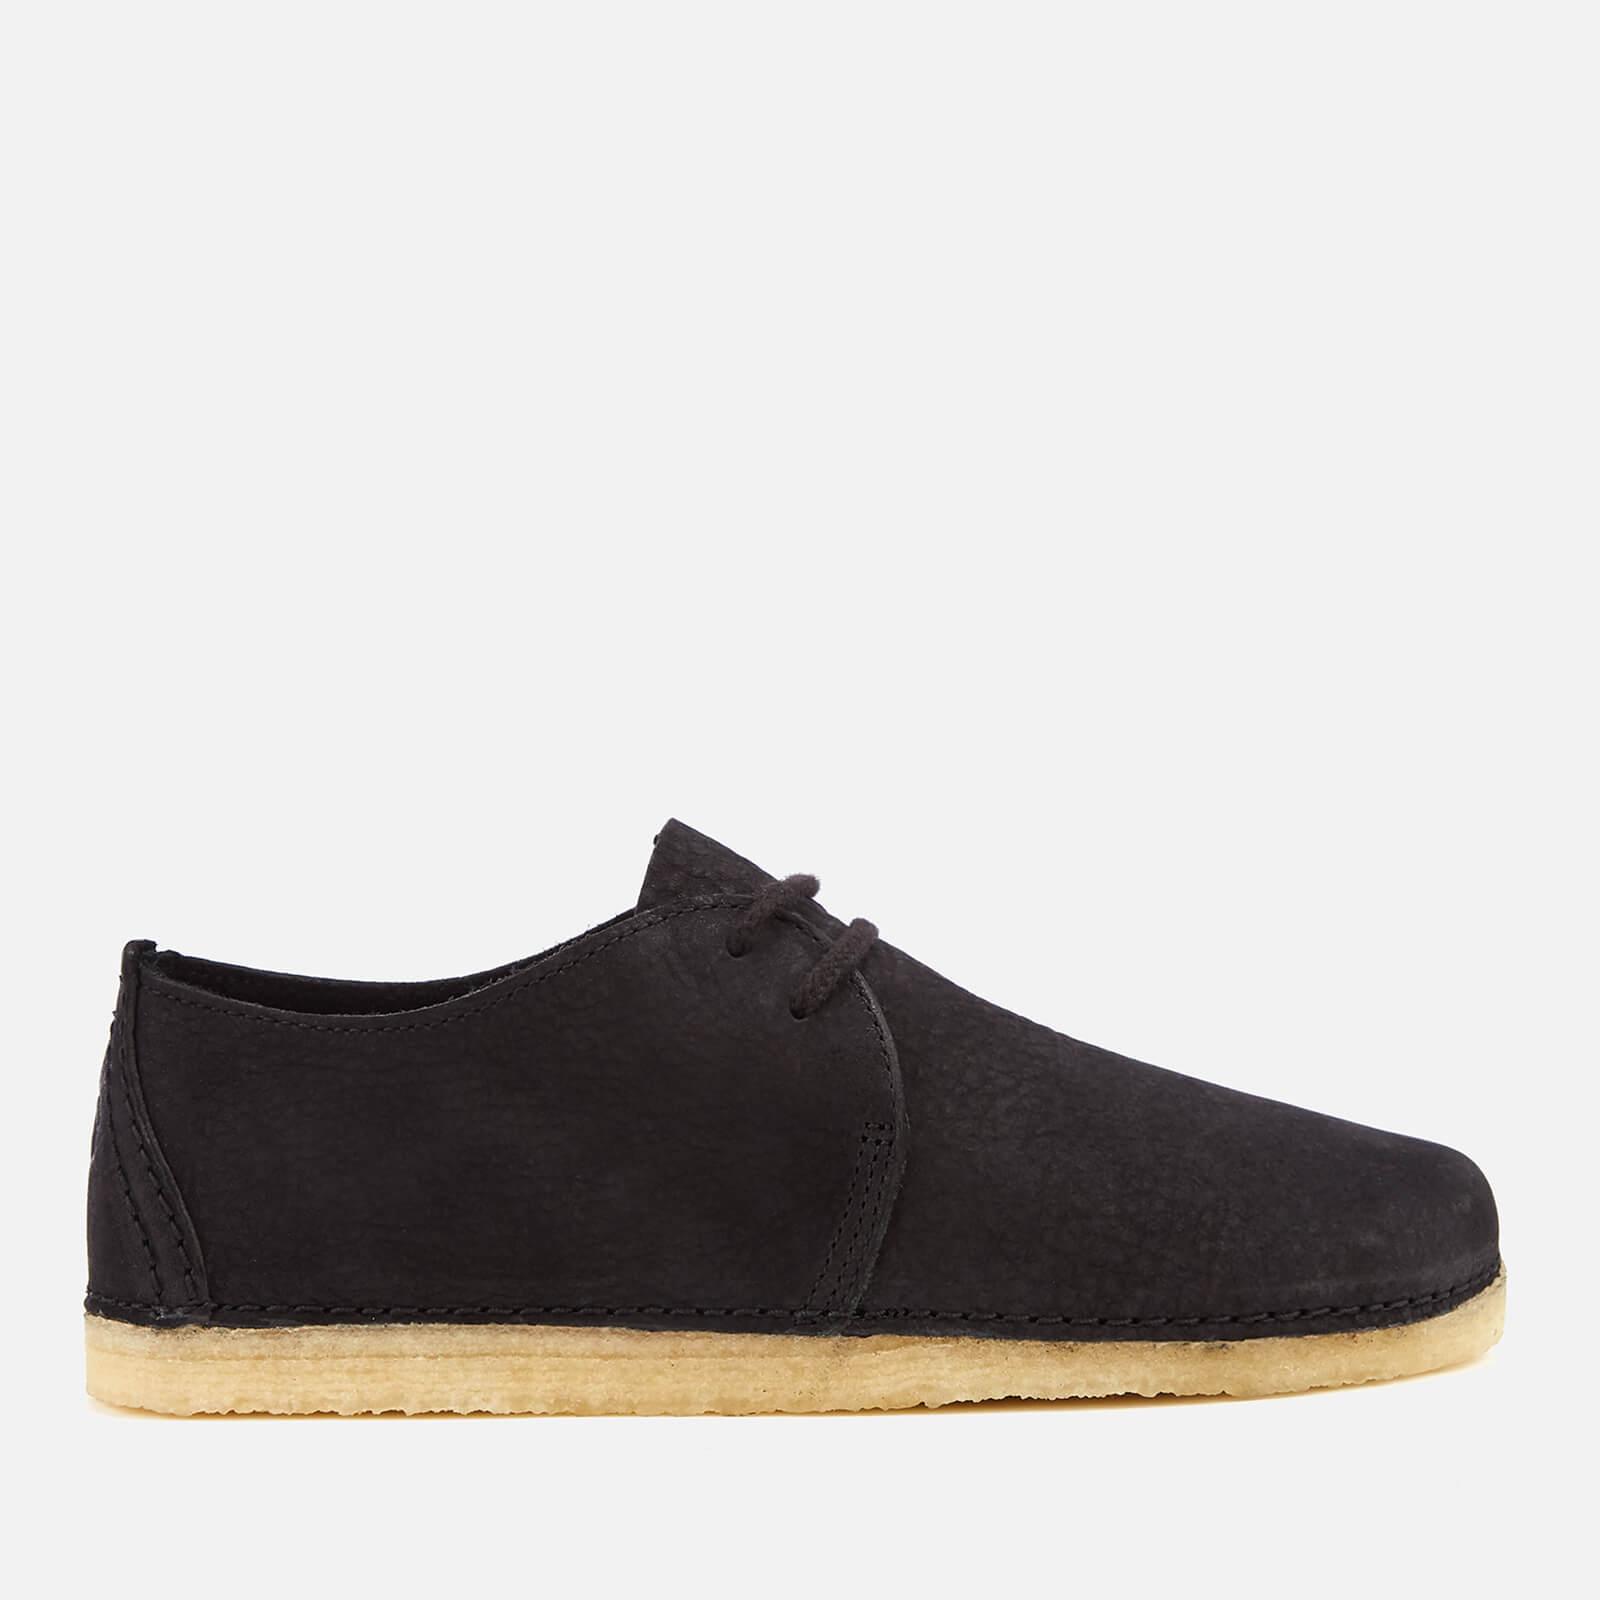 Clarks Originals Women's Ashton Nubuck Lace Up Shoes - Black - UK 3 - Black